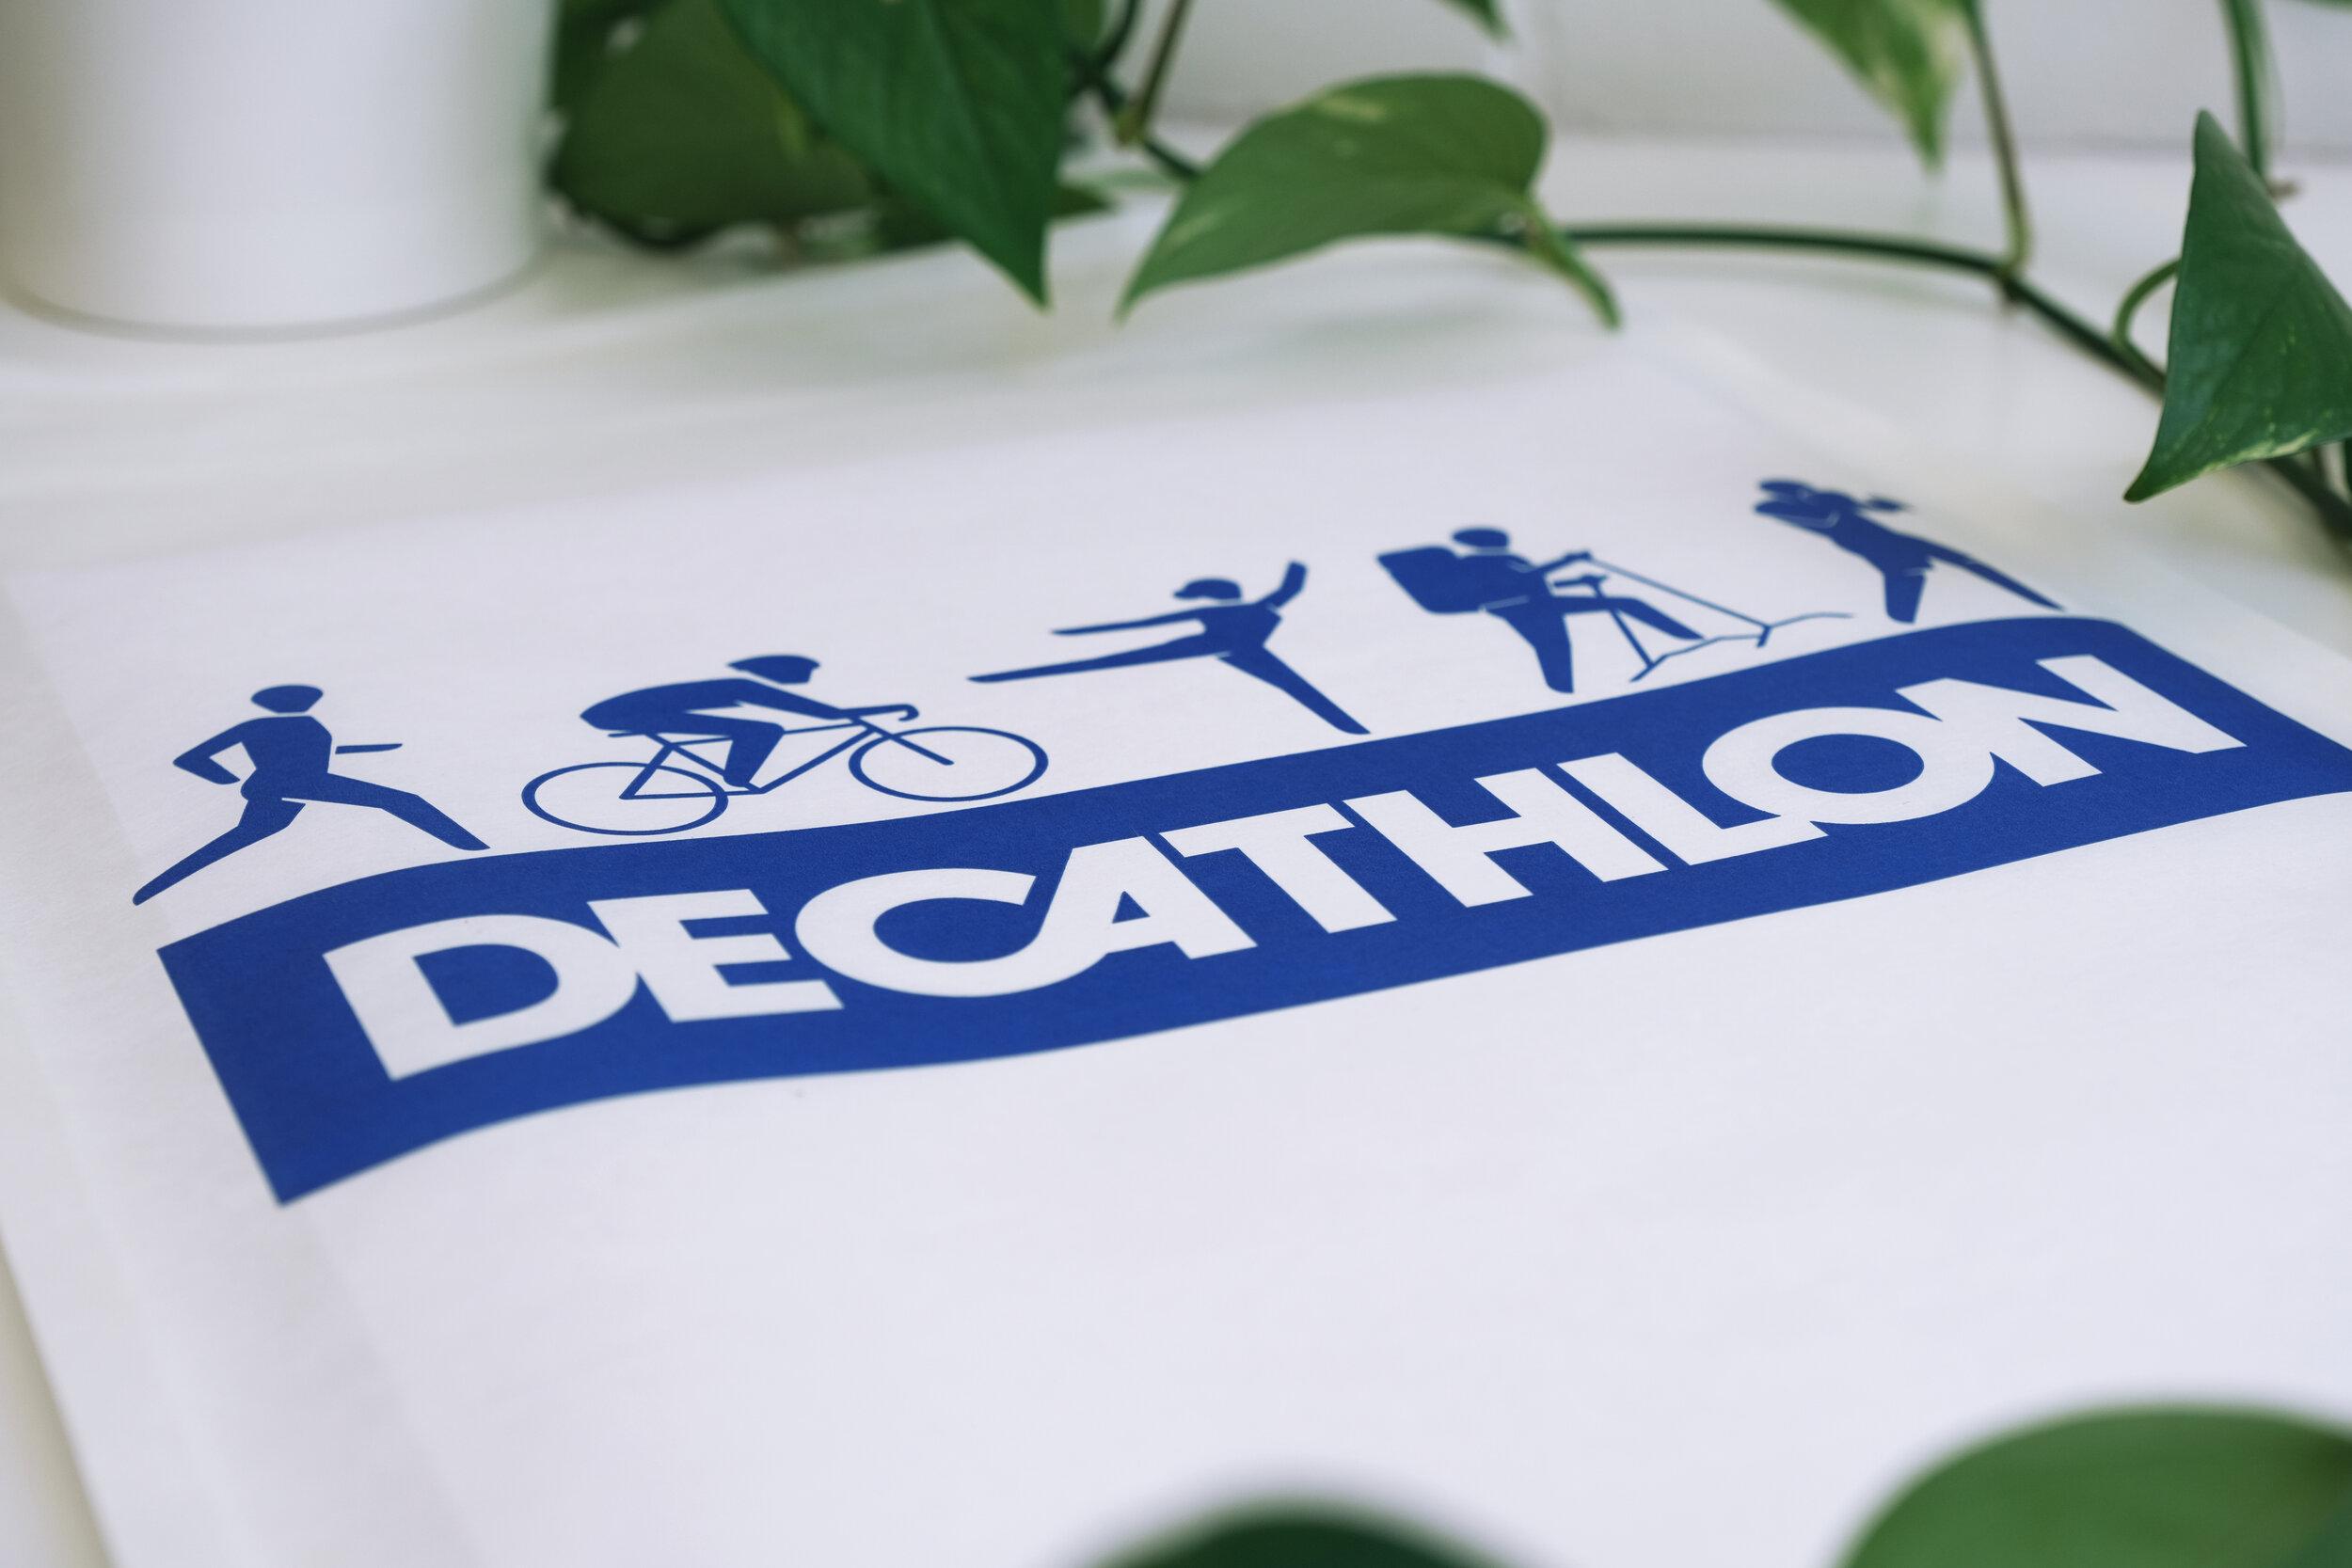 Decathlon2psd.jpg